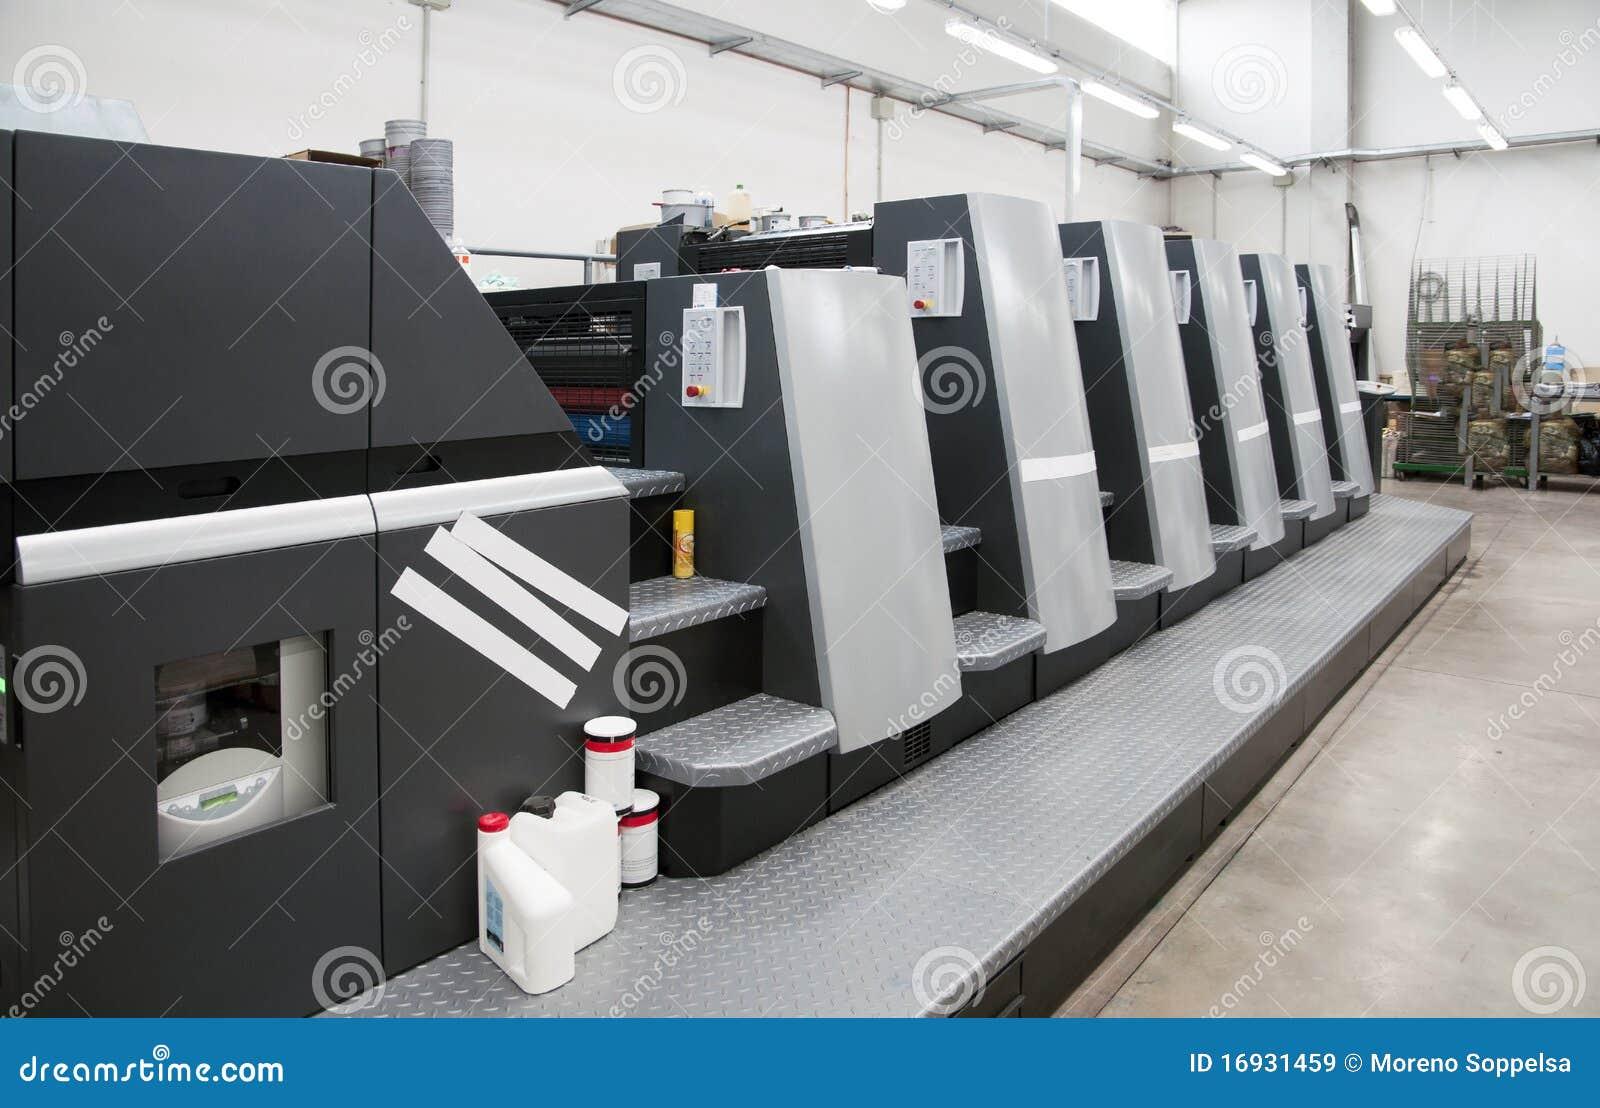 Impresión de la prensa (imprenta) - desplazamiento